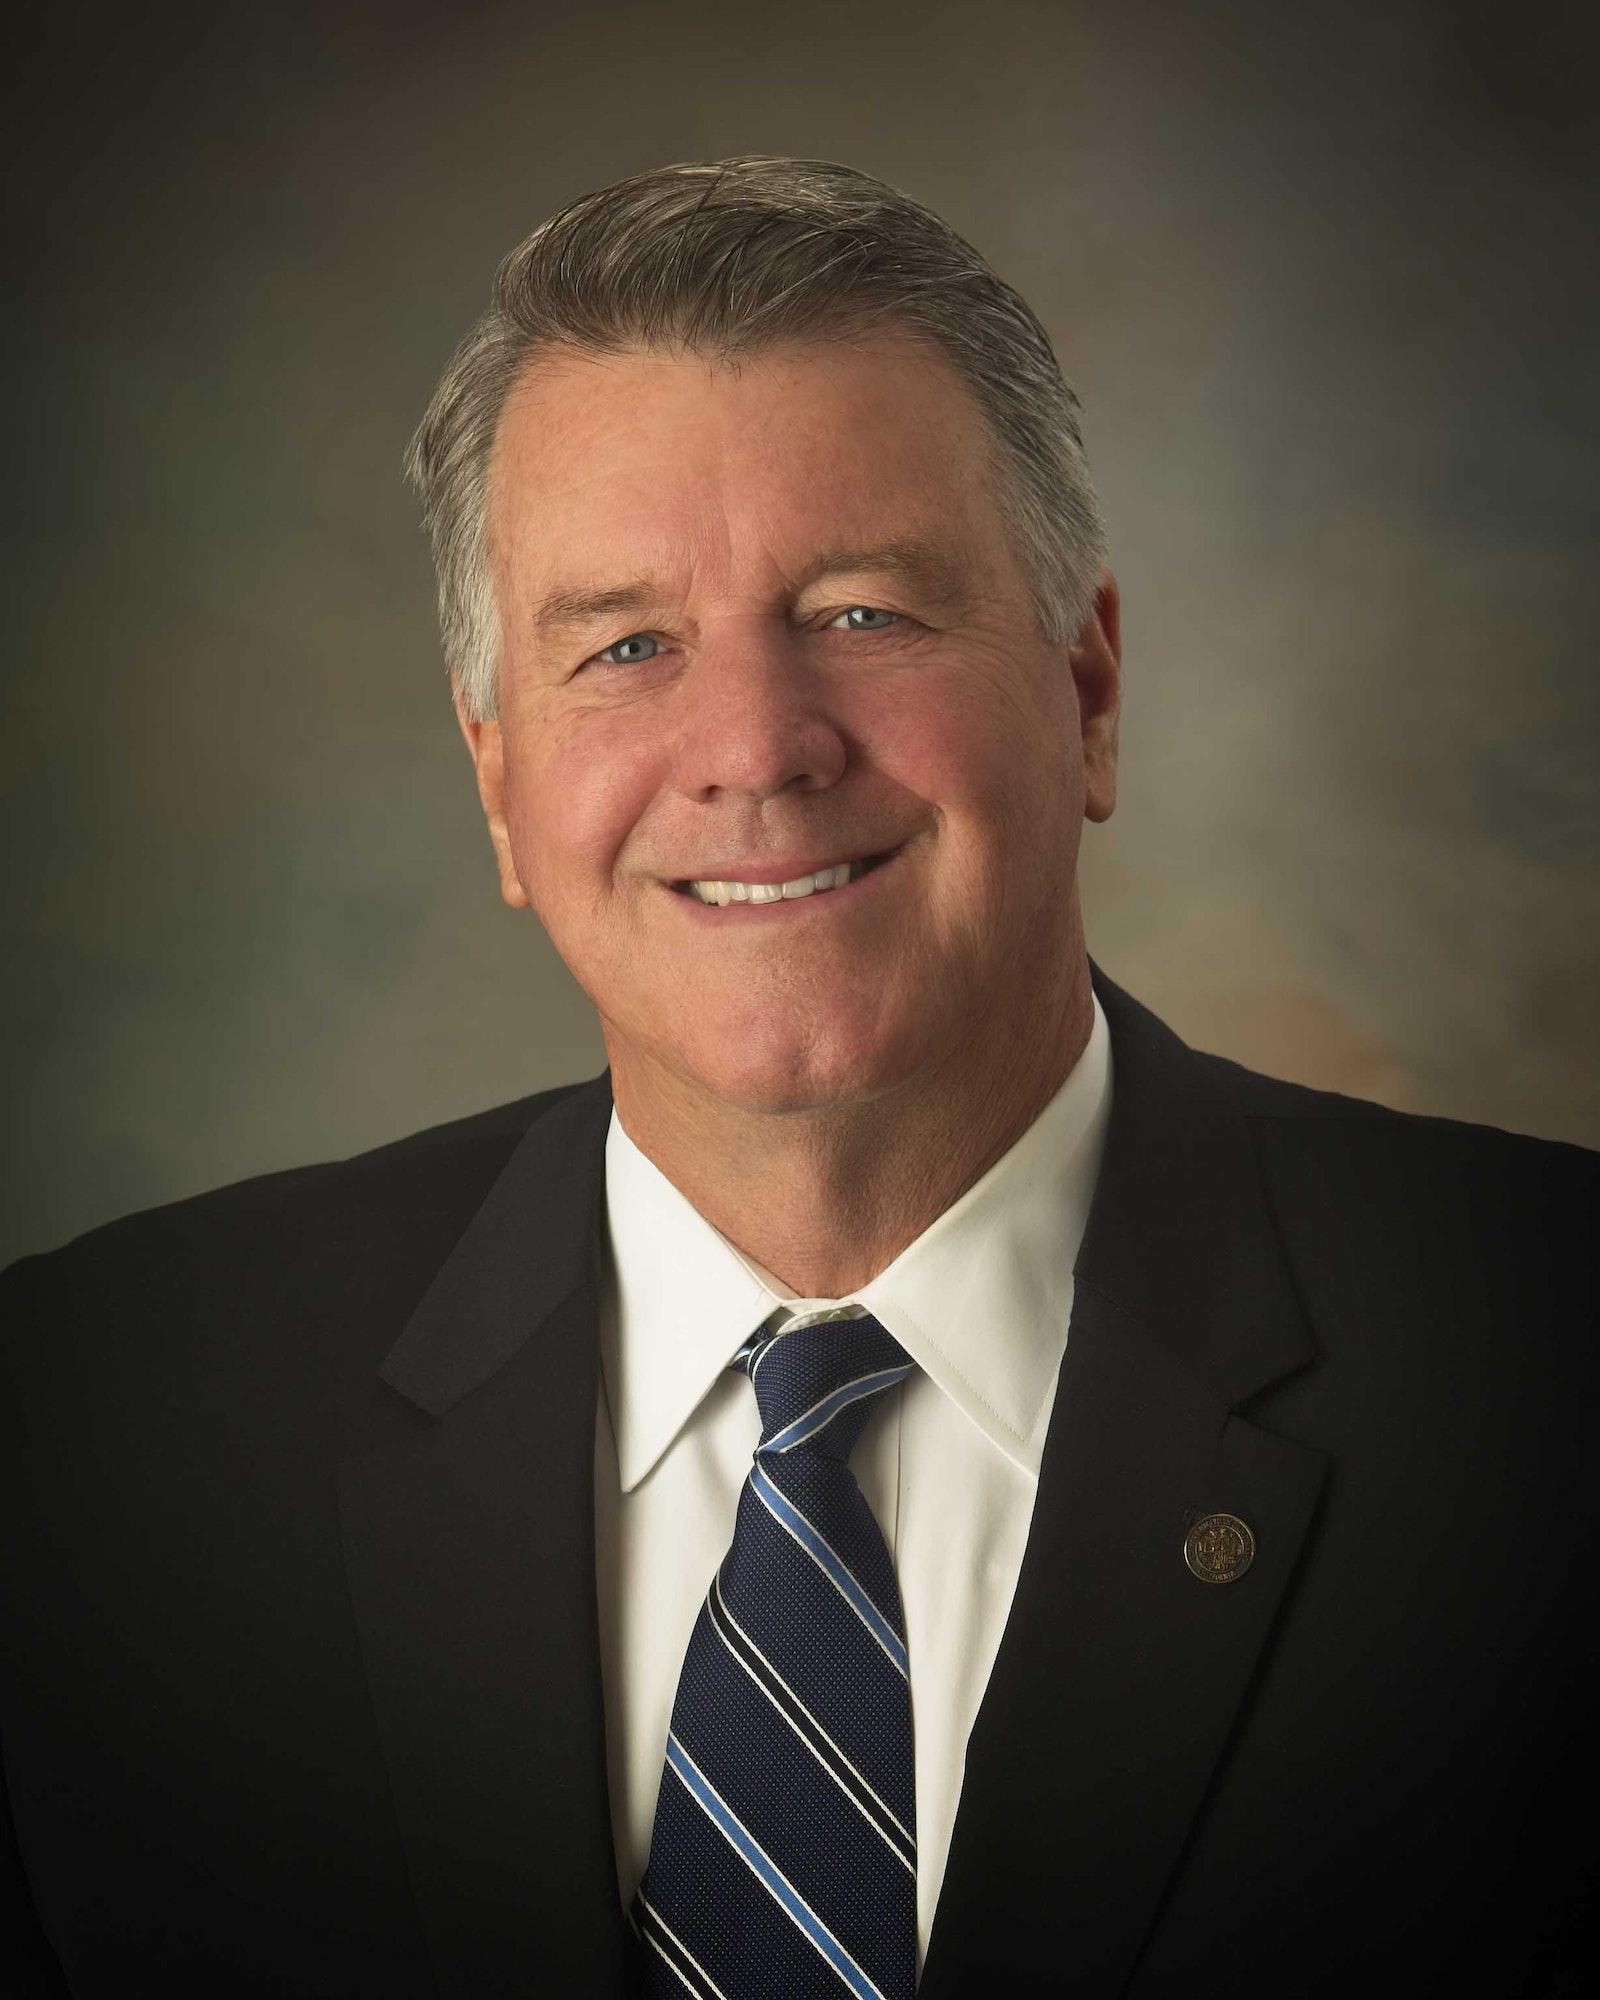 San Juan Capistrano Trustee. John Taylor